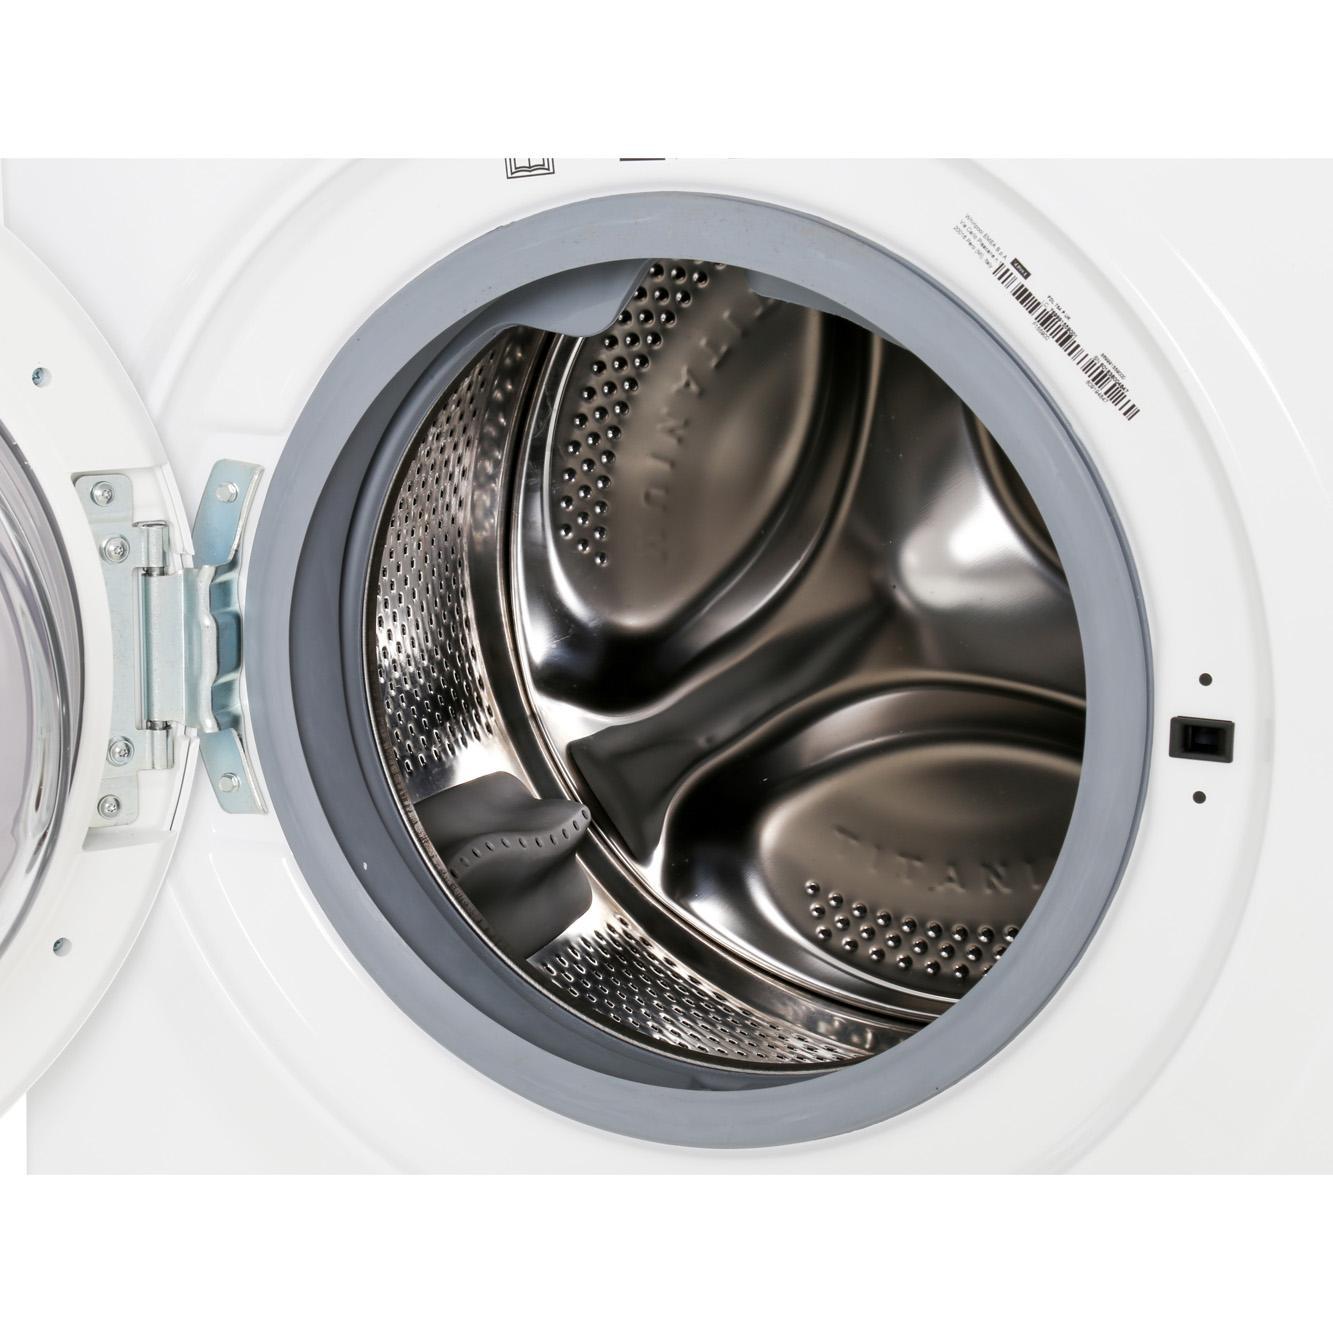 Buy Hotpoint Fdl 7540 P Uk Washer Dryer Fdl7540puk